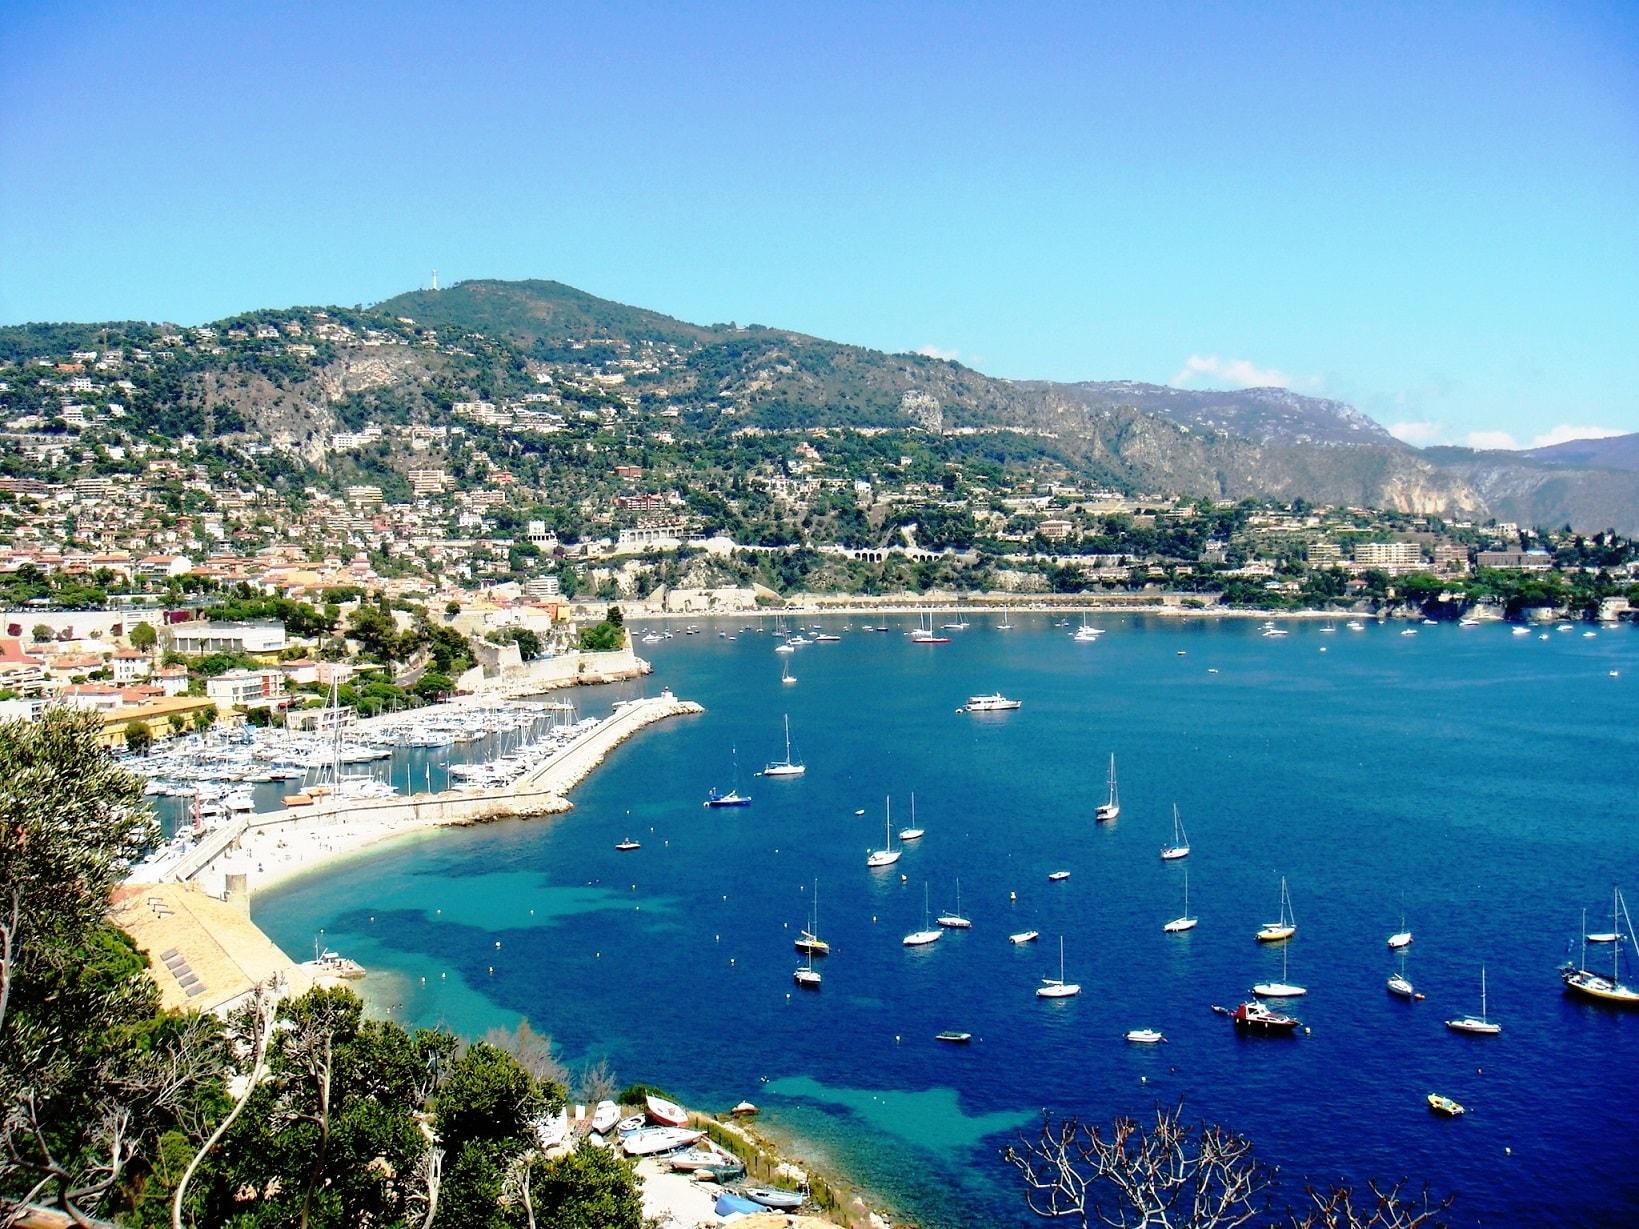 Chauffeur Business à Nice alpes-maritimes Alpes-Maritimes Côte-d'Azur